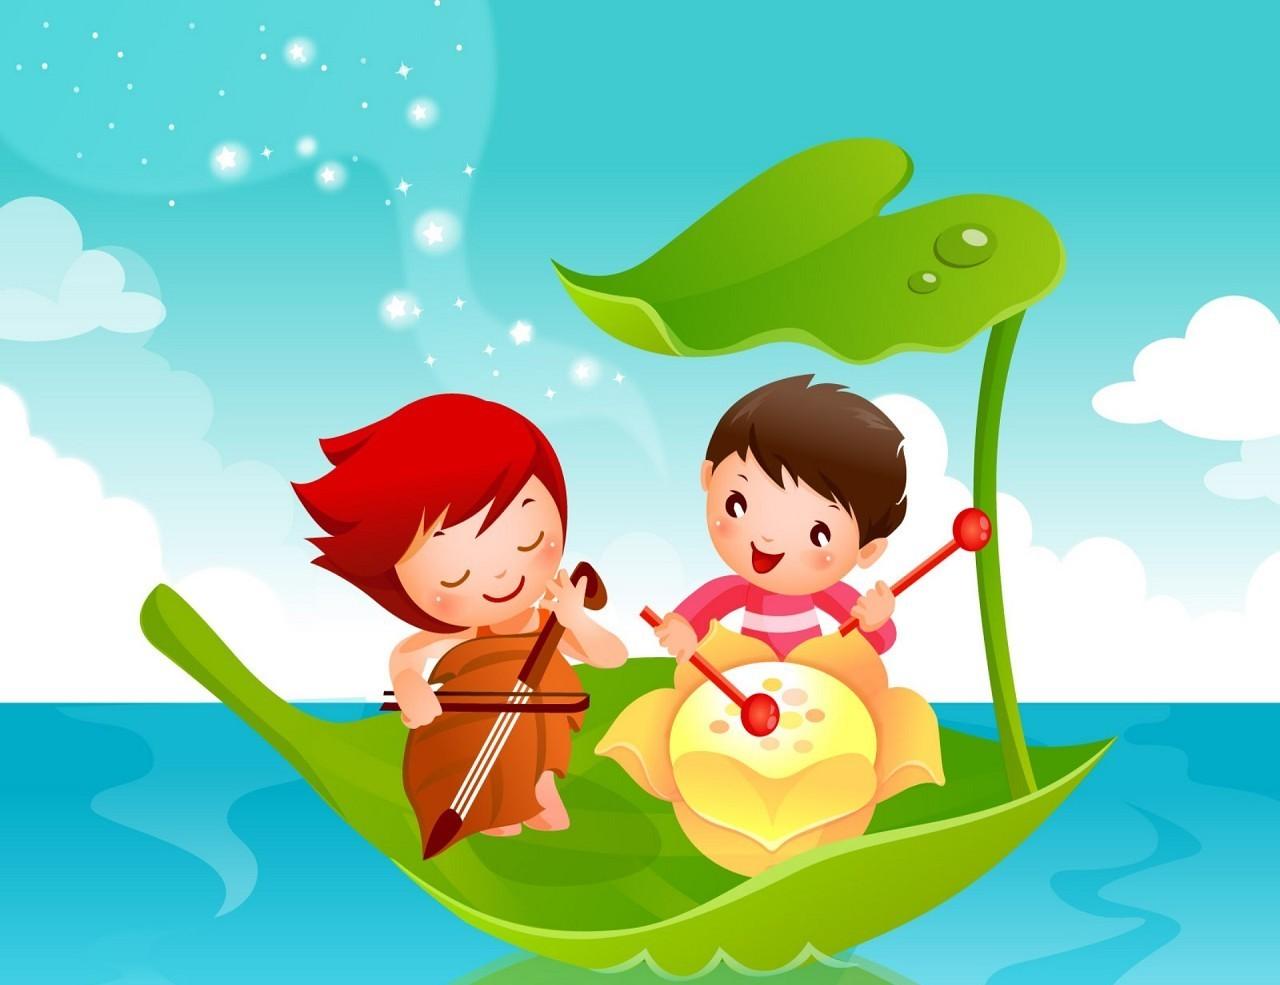 http://nip-sagiad.thesp.sch.gr/wordpress/wp-content/uploads/2017/03/lovely_childrens_cartoon_wallpaper.jpg